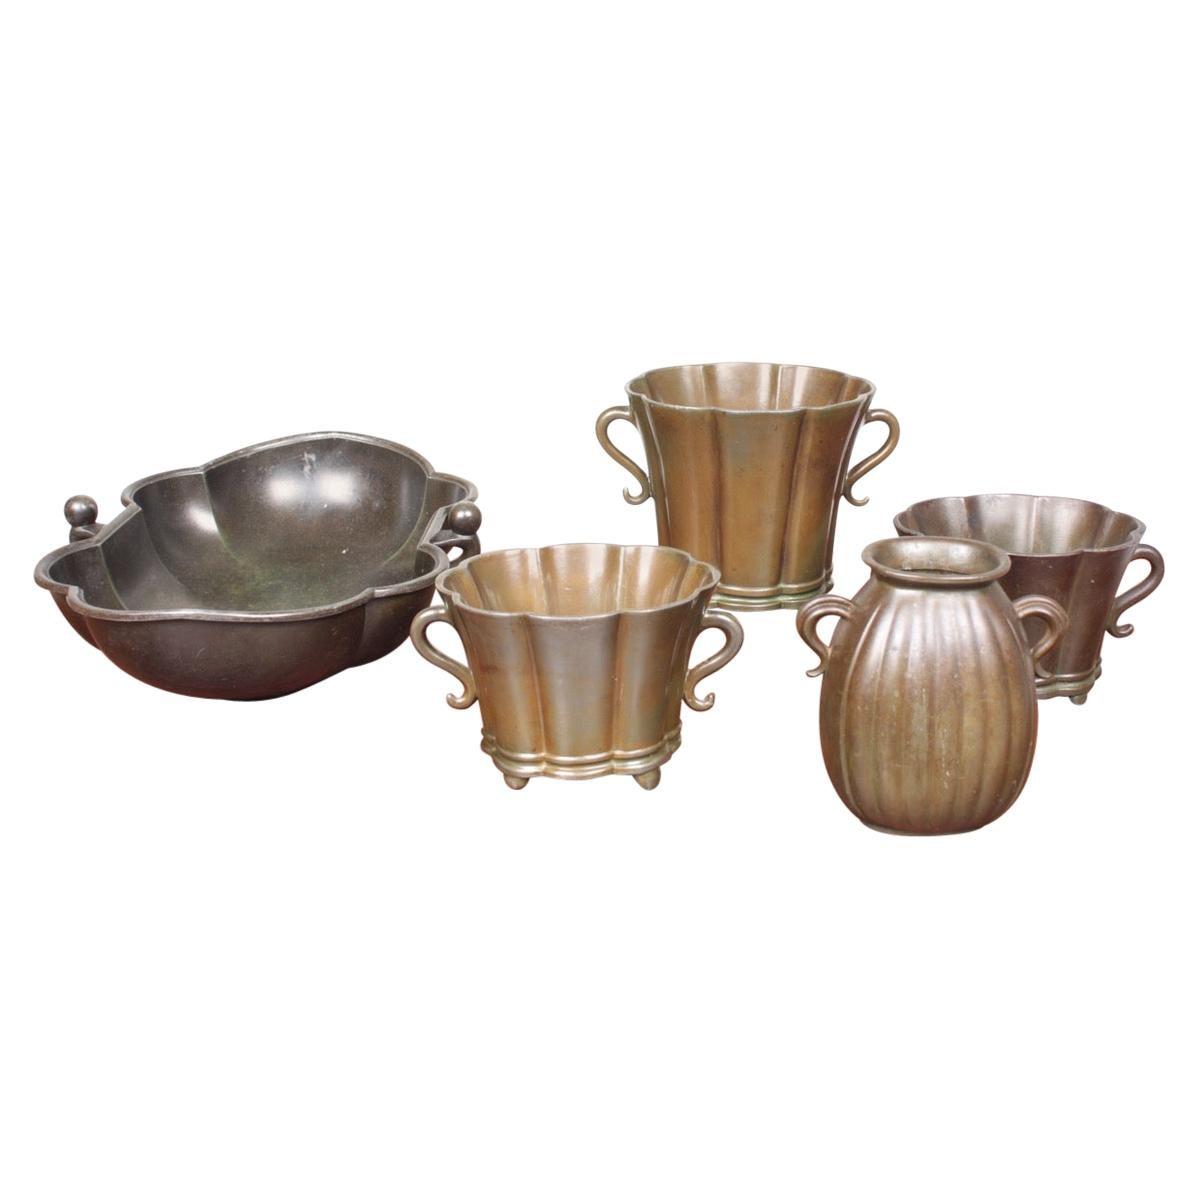 Group of Vases in Disco Metal by Just Andersen Made in Denmark, 1940s